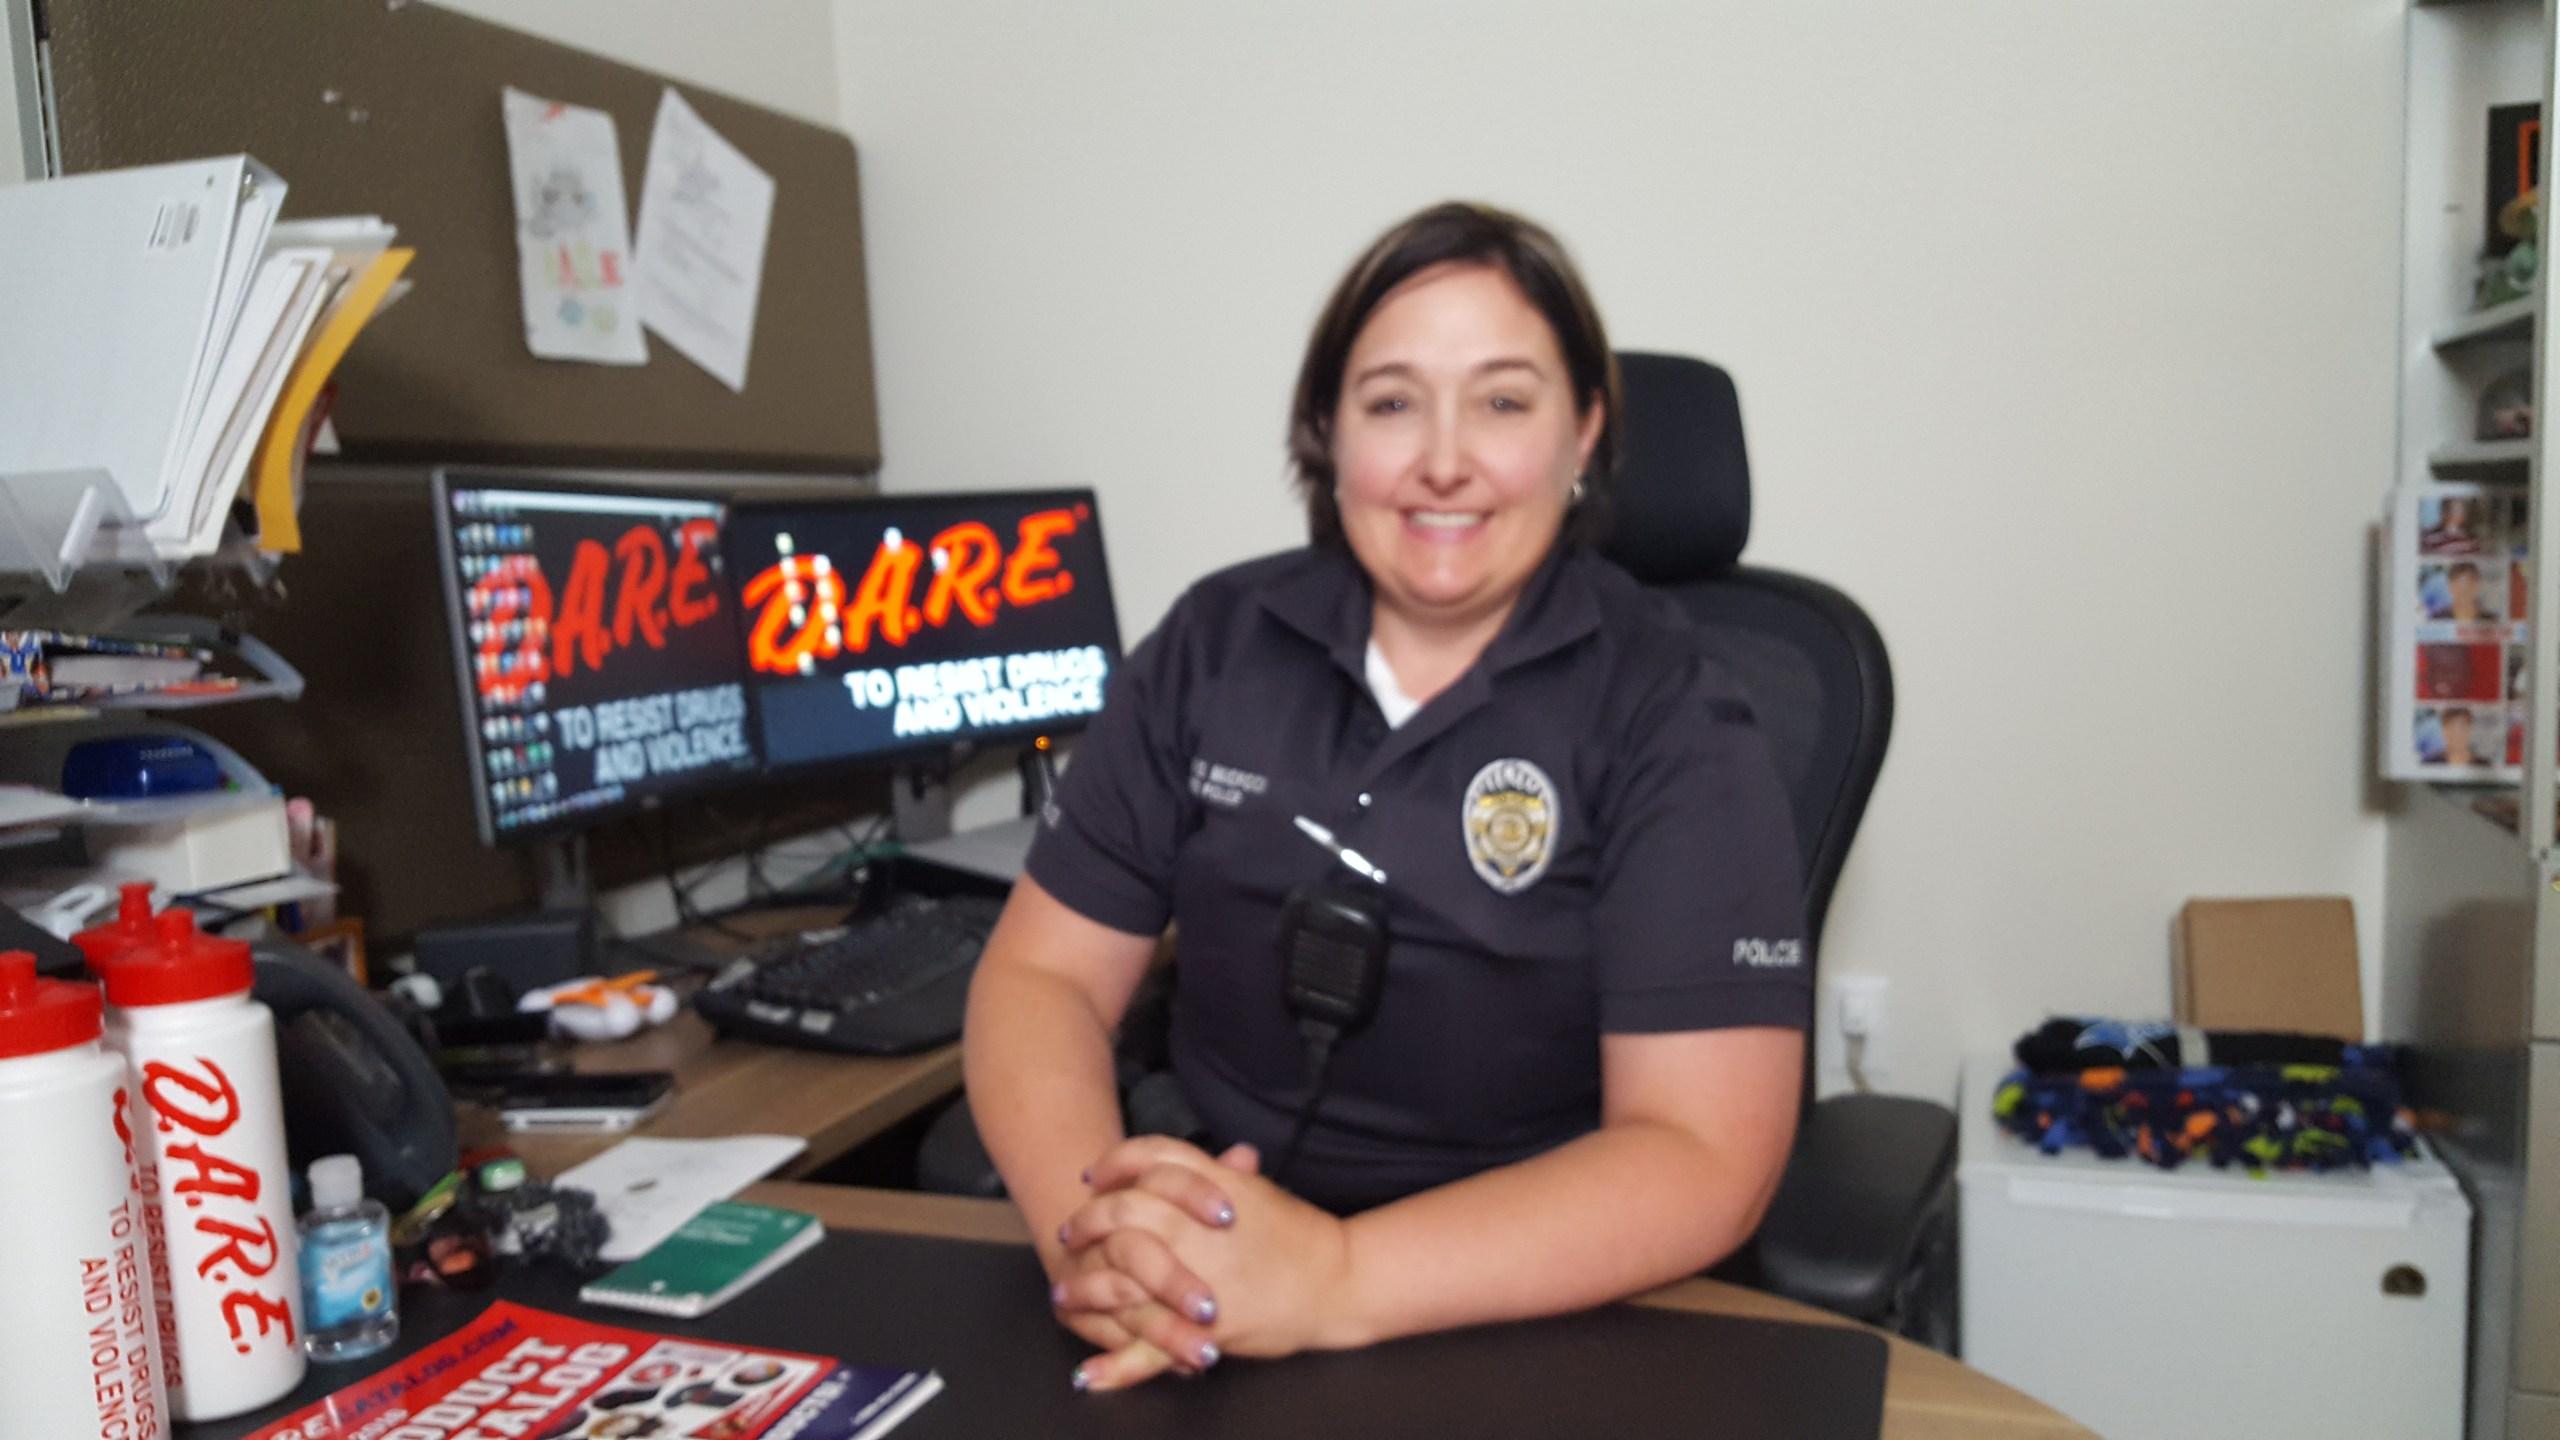 Behind the Badge - Officer Dana Mudrock - DARE 3_1466146836175.jpg